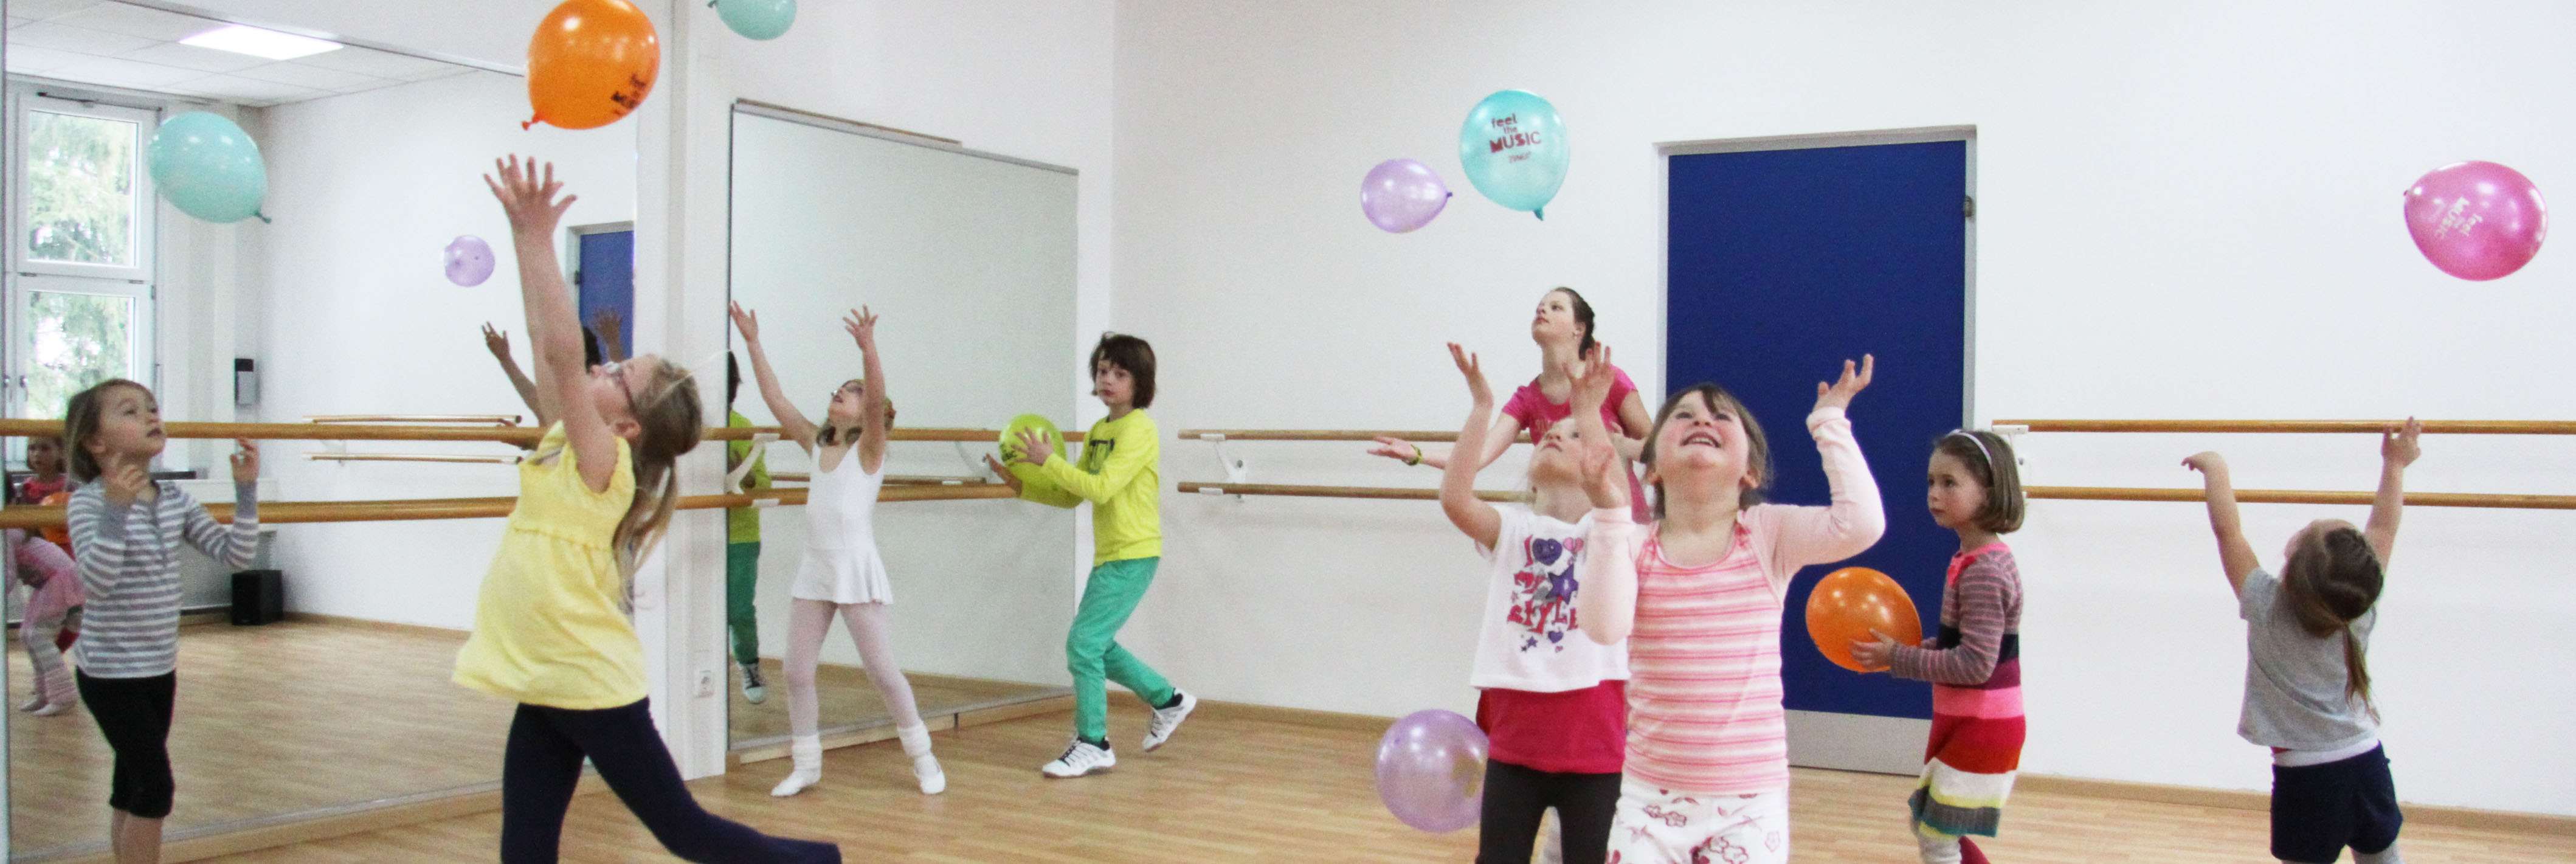 Studio-Elodie-Murnau-Kinderturnen-04